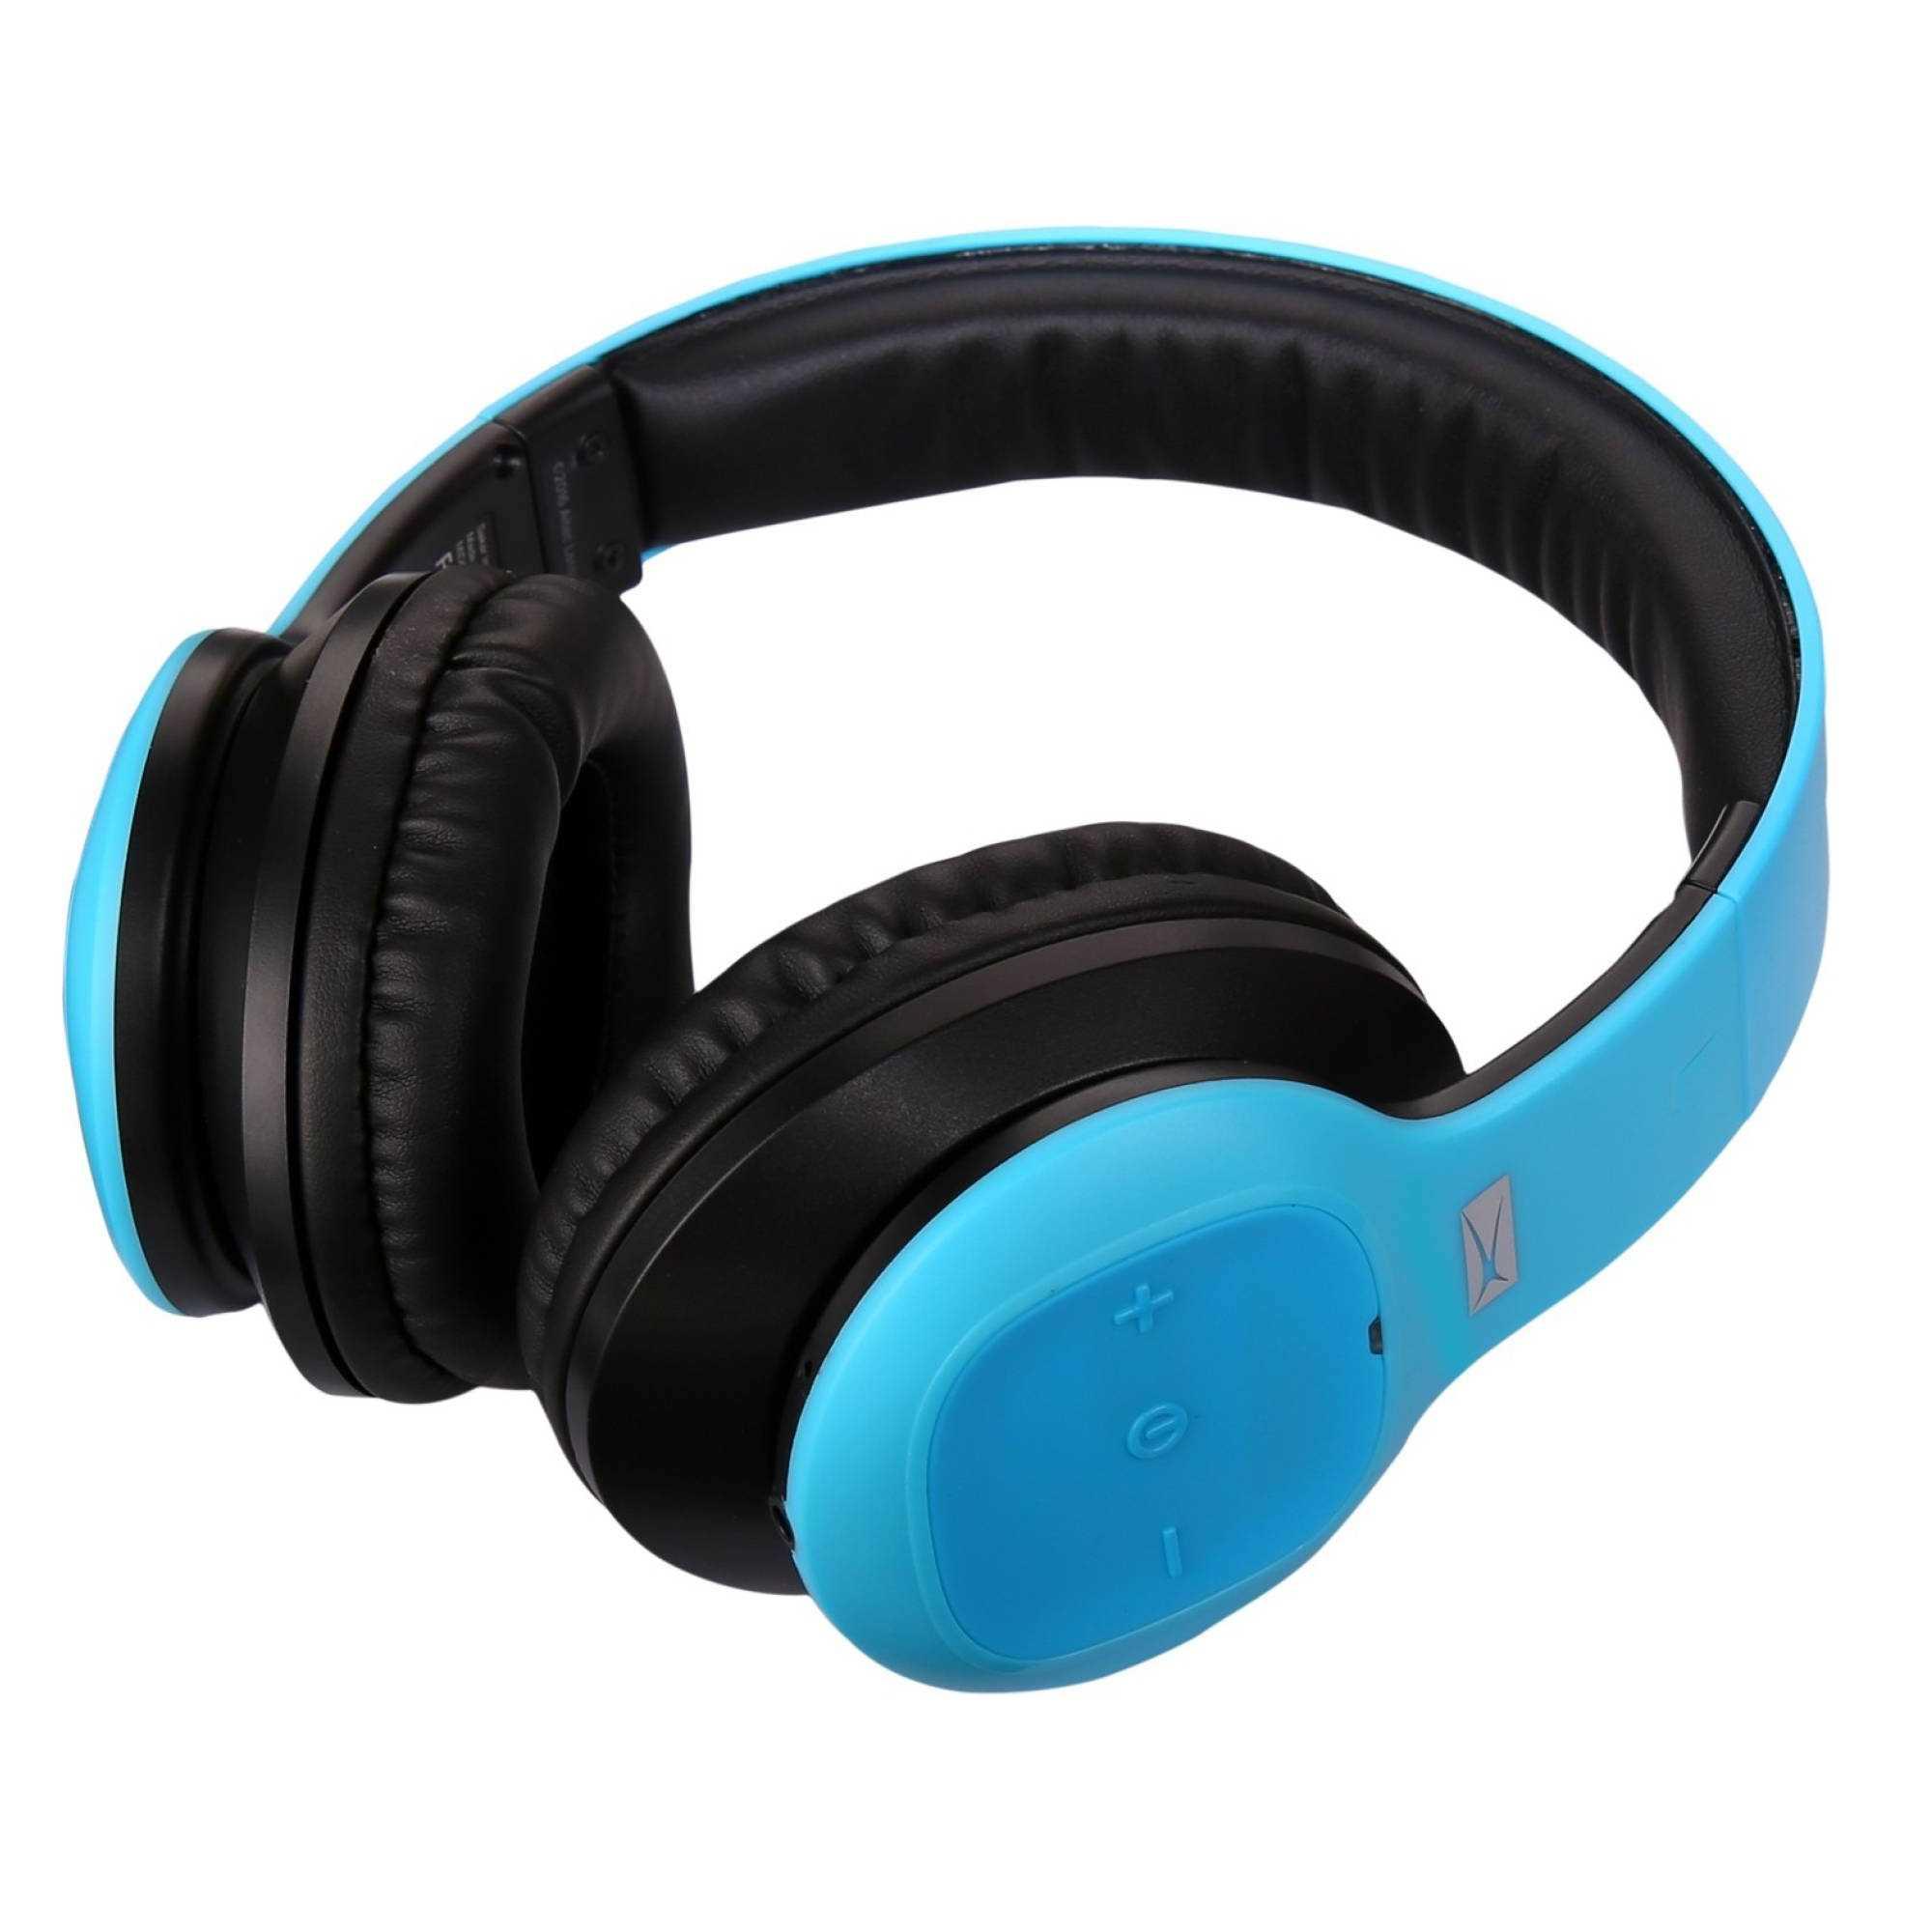 Altec Lansing MZW300 Wired and Wireless Headphone Price {13 Jul 2018 ...